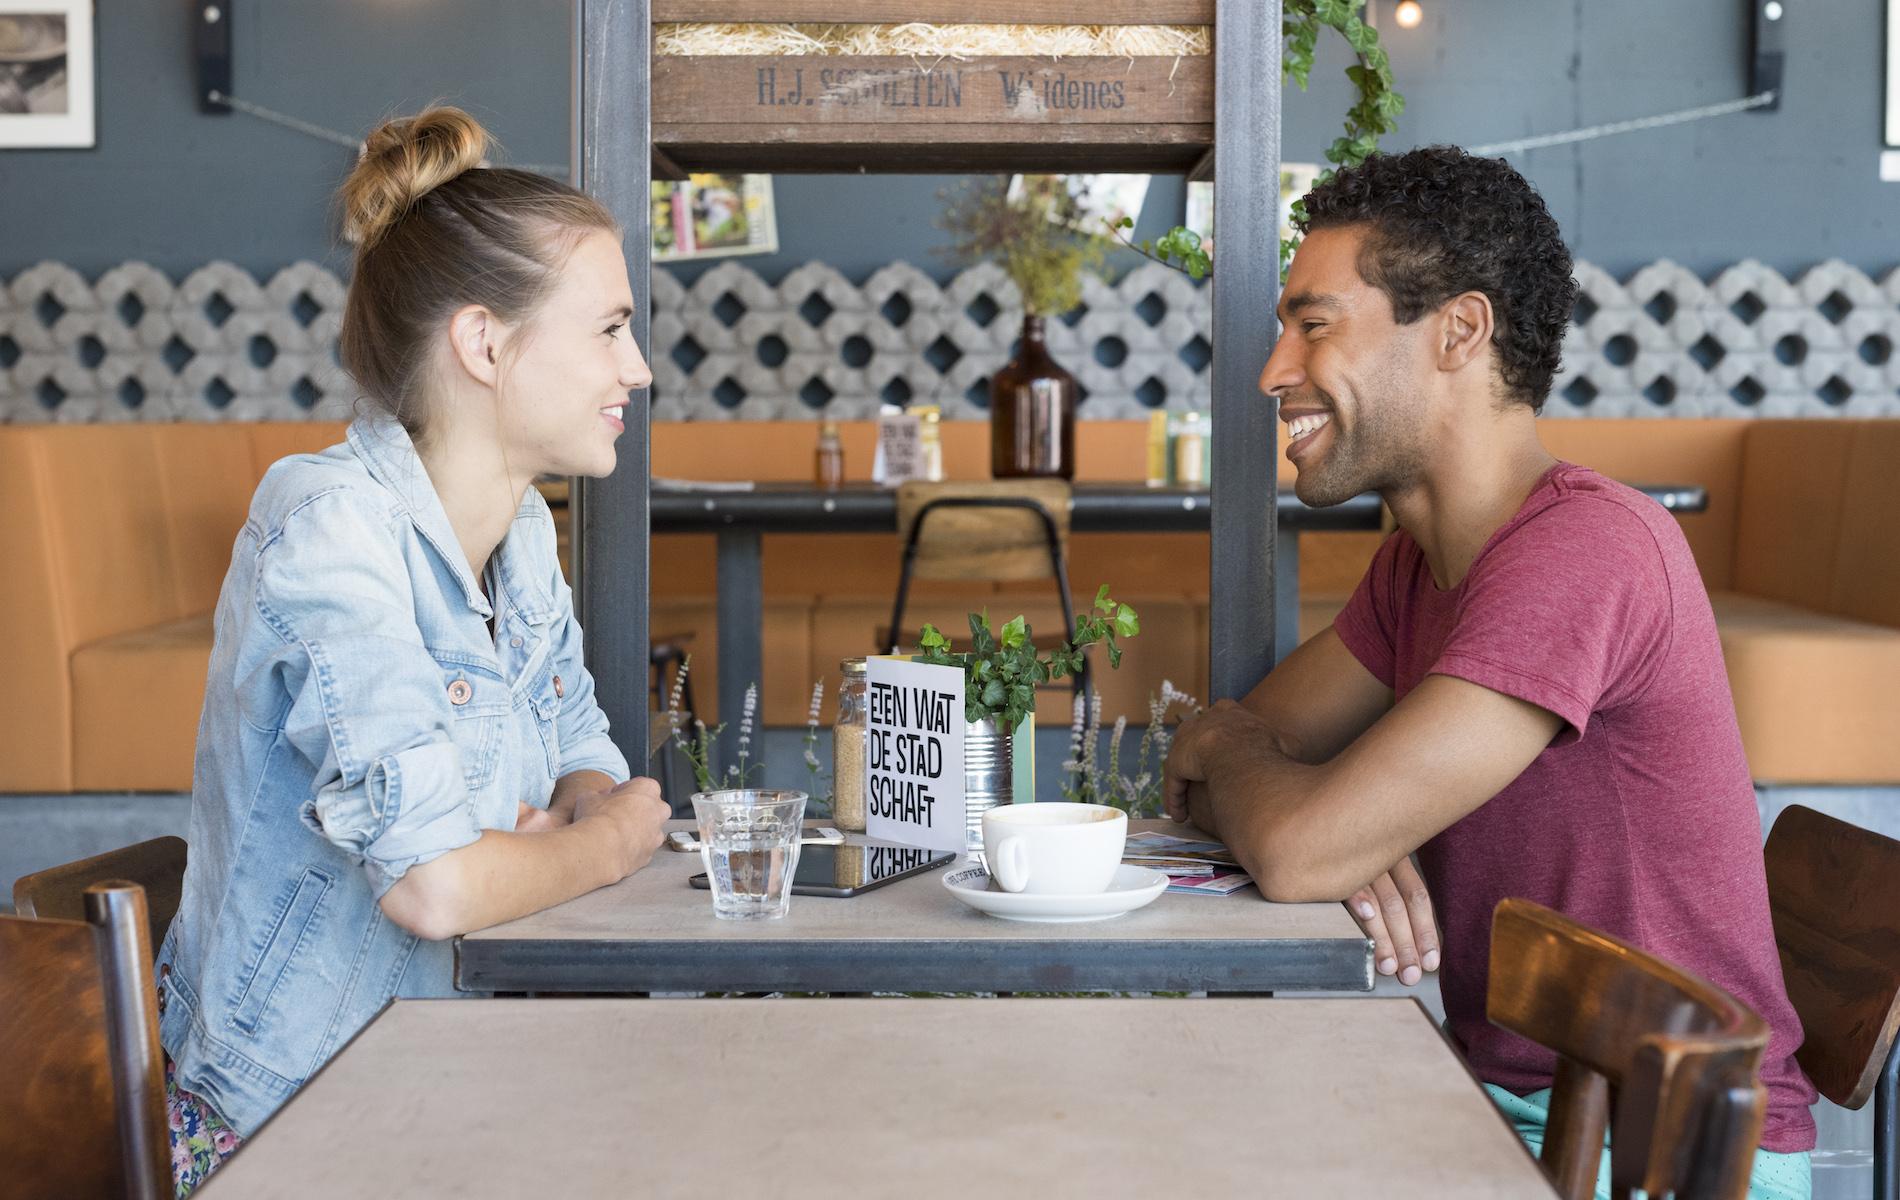 Hoe maak je online dating succesvol